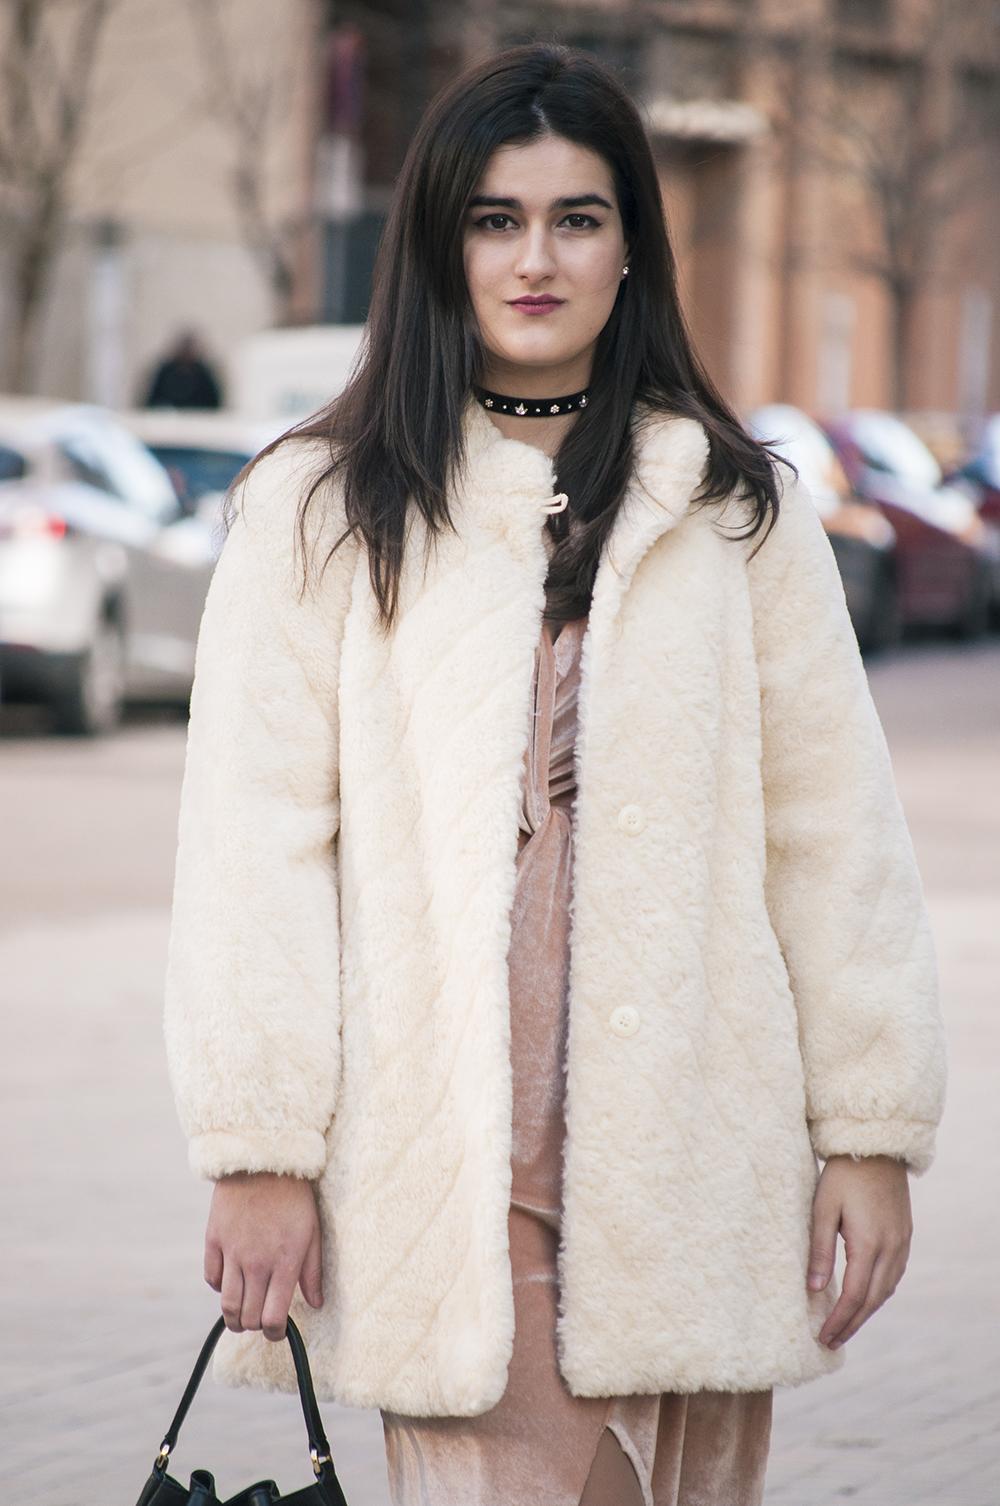 something fashion, spain valencia blogger moda, terciopelo vestido dress velvet pink zara 2017, vintage choker look outfit boots